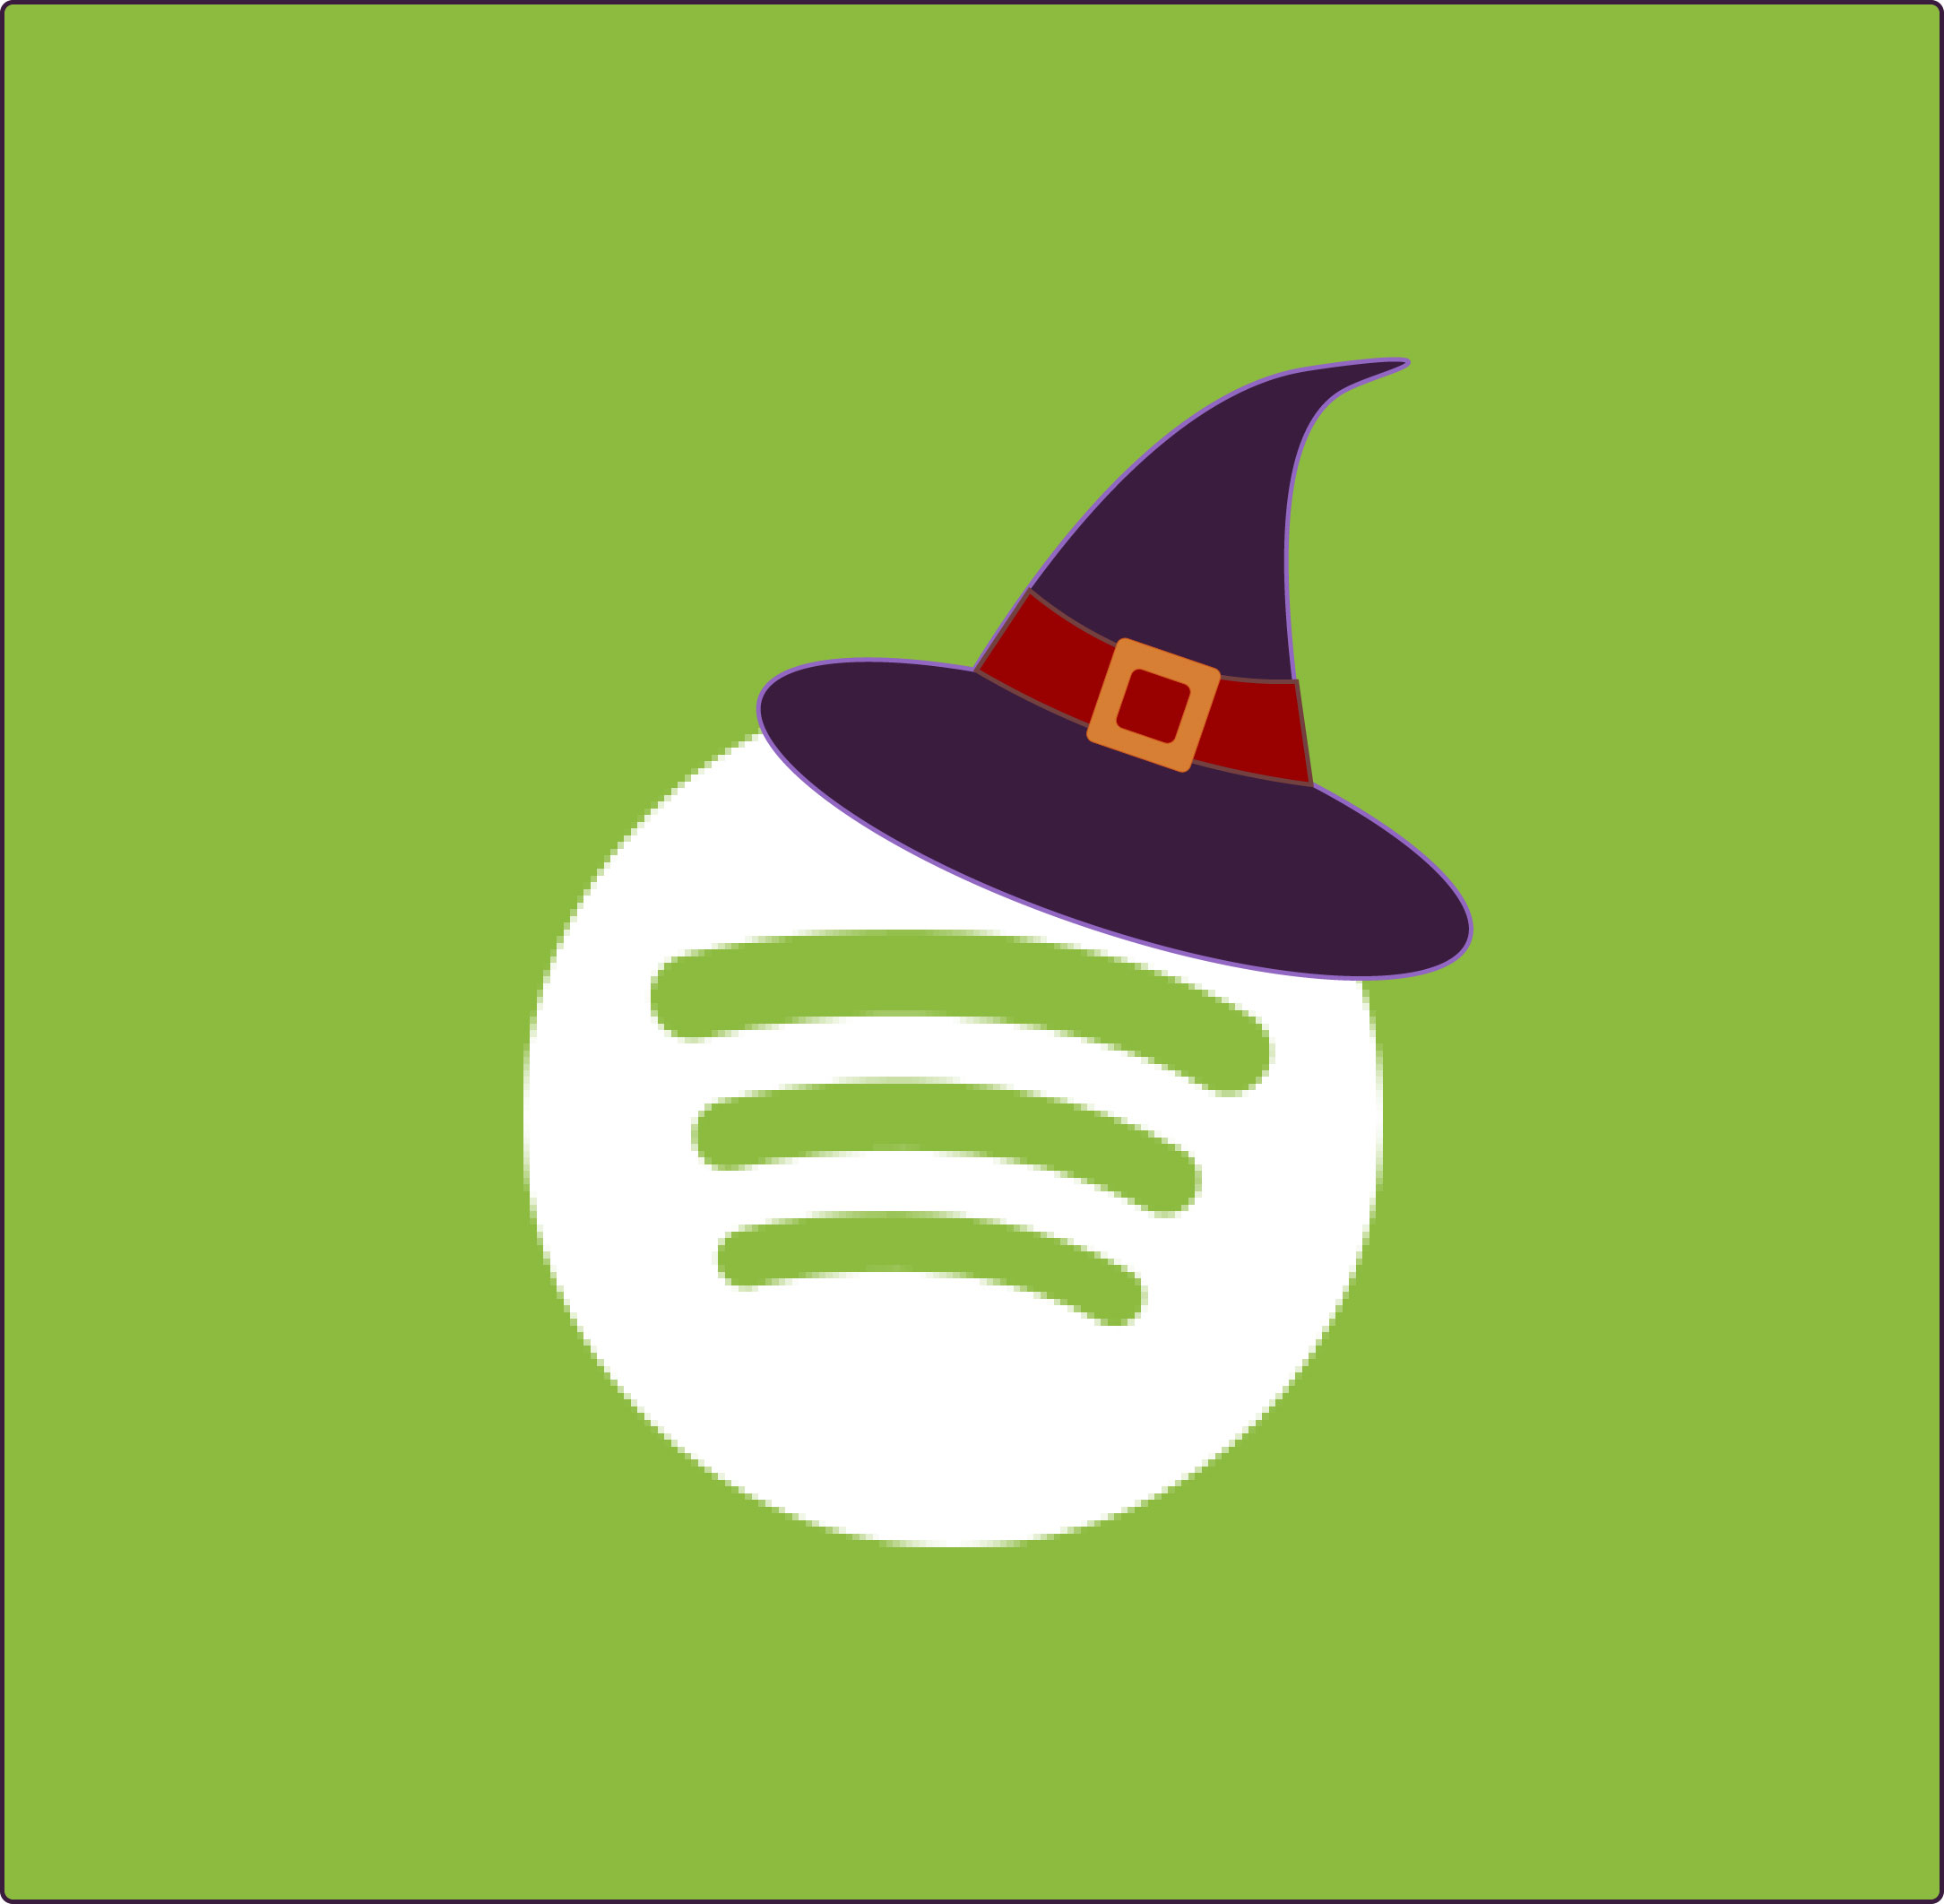 Spotify Halloween App Icon from HalloweenCostumes.com